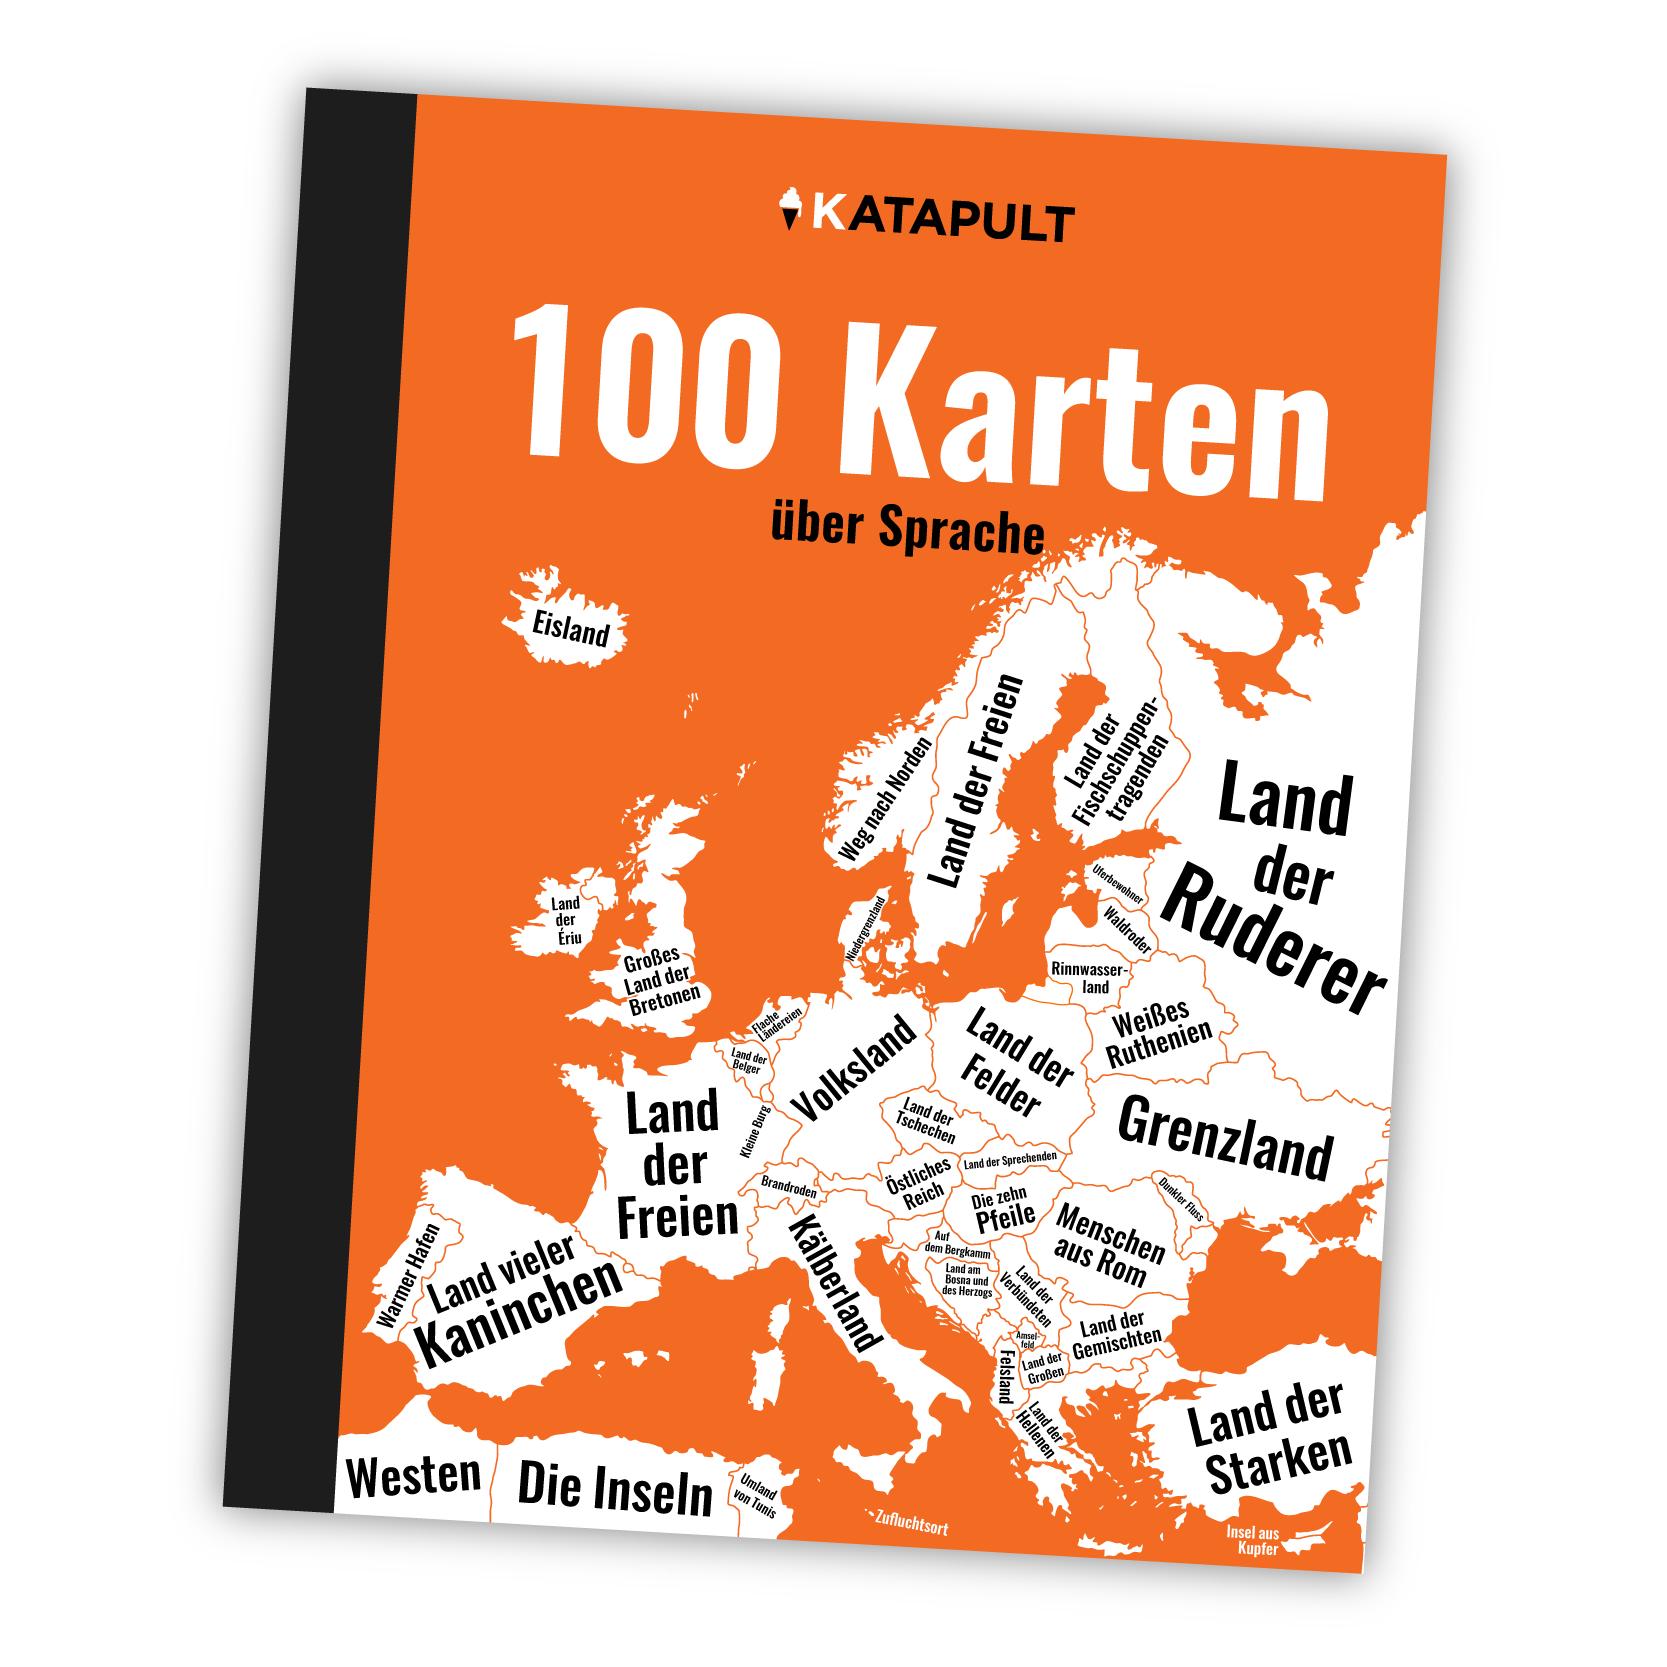 KATAPULT - Atlas: 100 Karten über Sprache